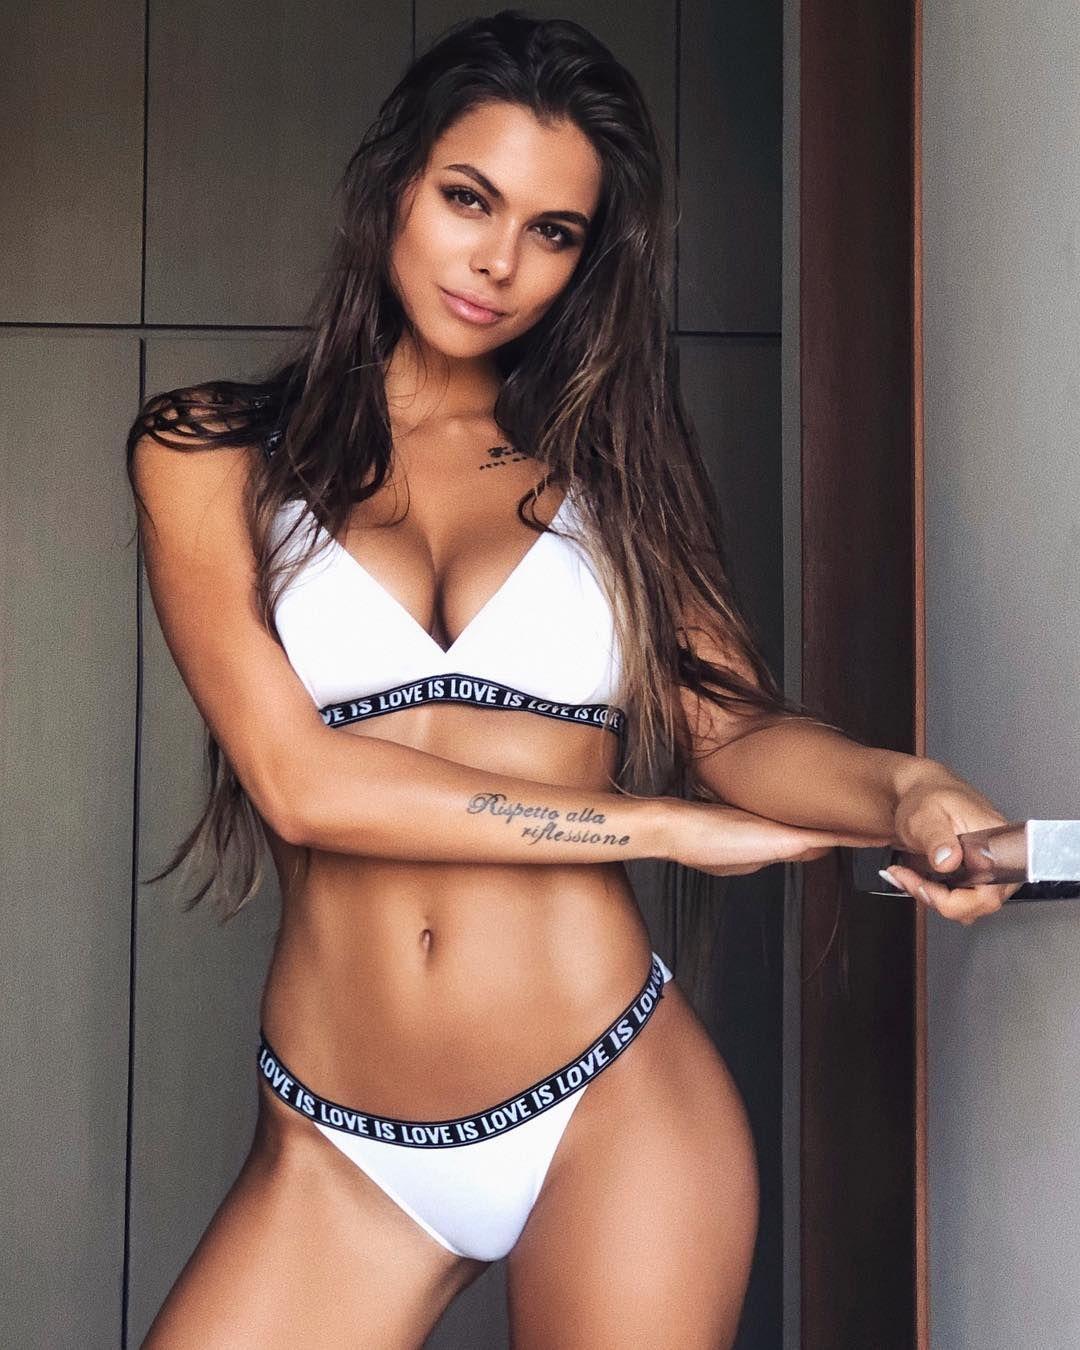 Bikini Victoria Sophia naked (32 photo), Tits, Hot, Feet, cameltoe 2020